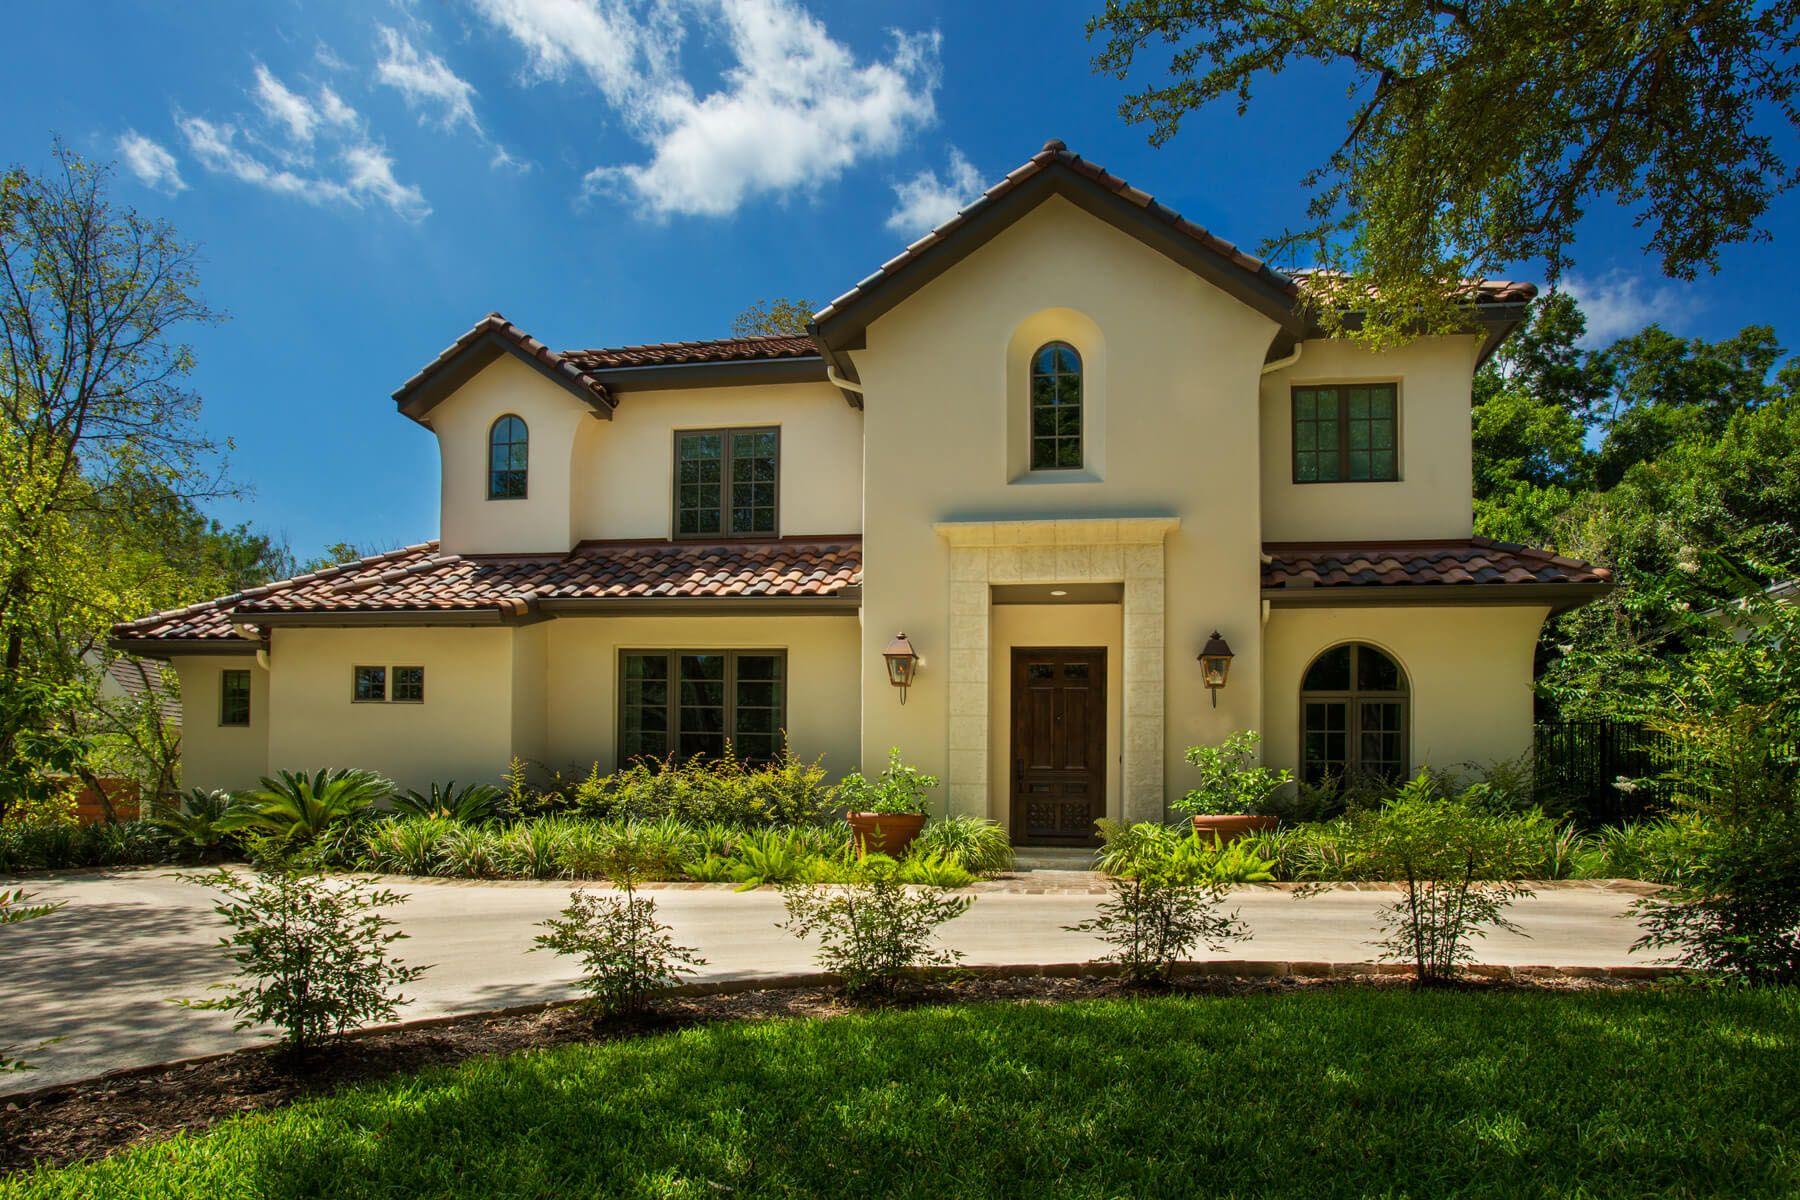 Nic Abbey Luxury Homes By Lisa Nichols Custom Home Builders House And Home Magazine Luxury Homes